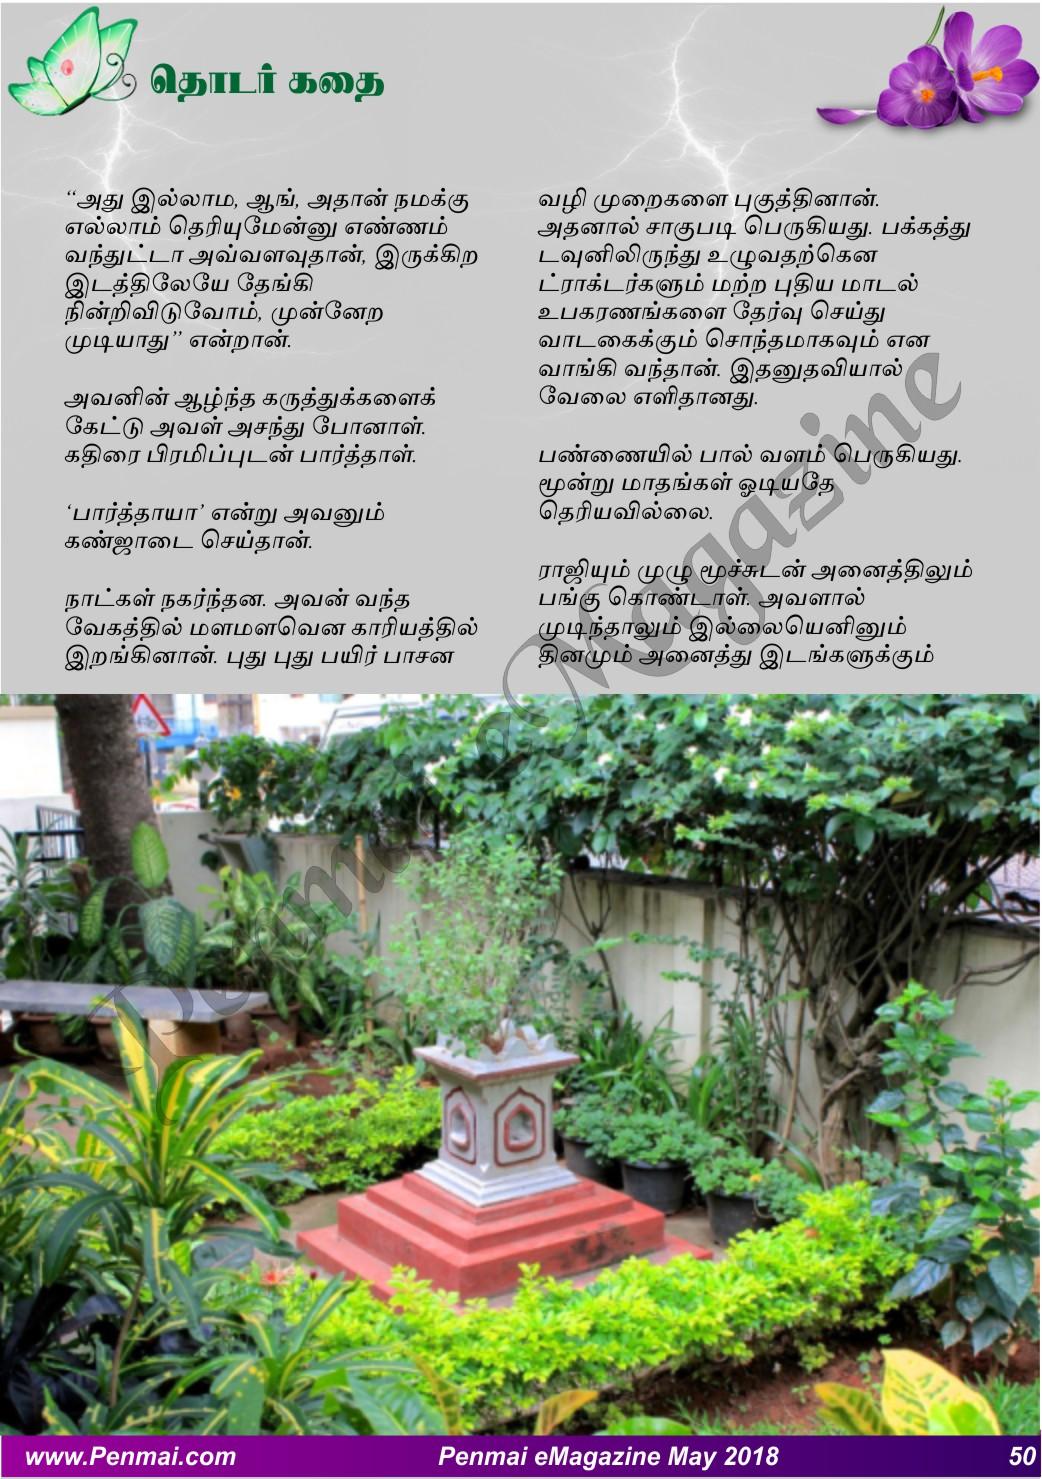 Penmai-eMagazine-May-2018-50.jpg